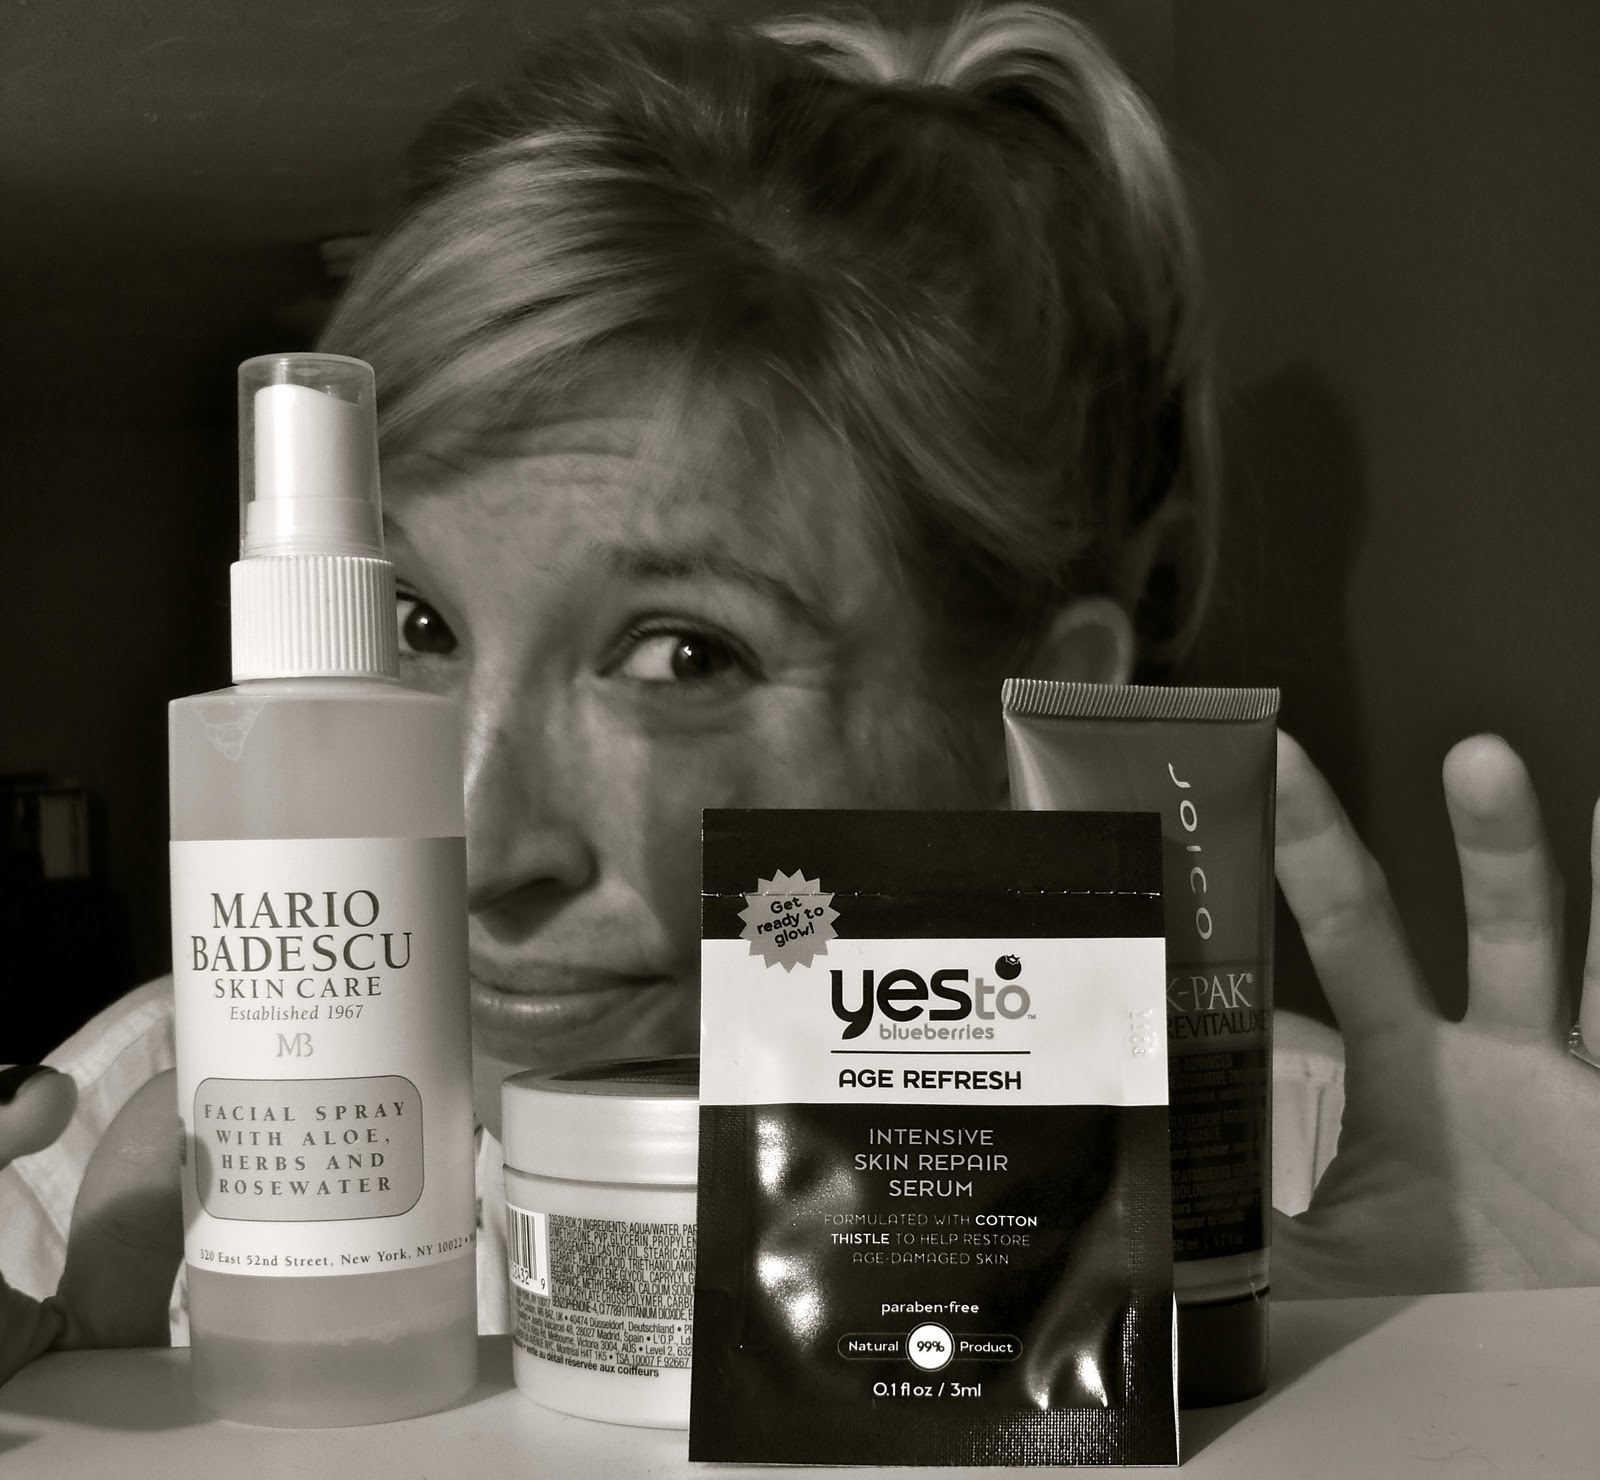 Skin Spa Boston Reviews For Laser Genesius